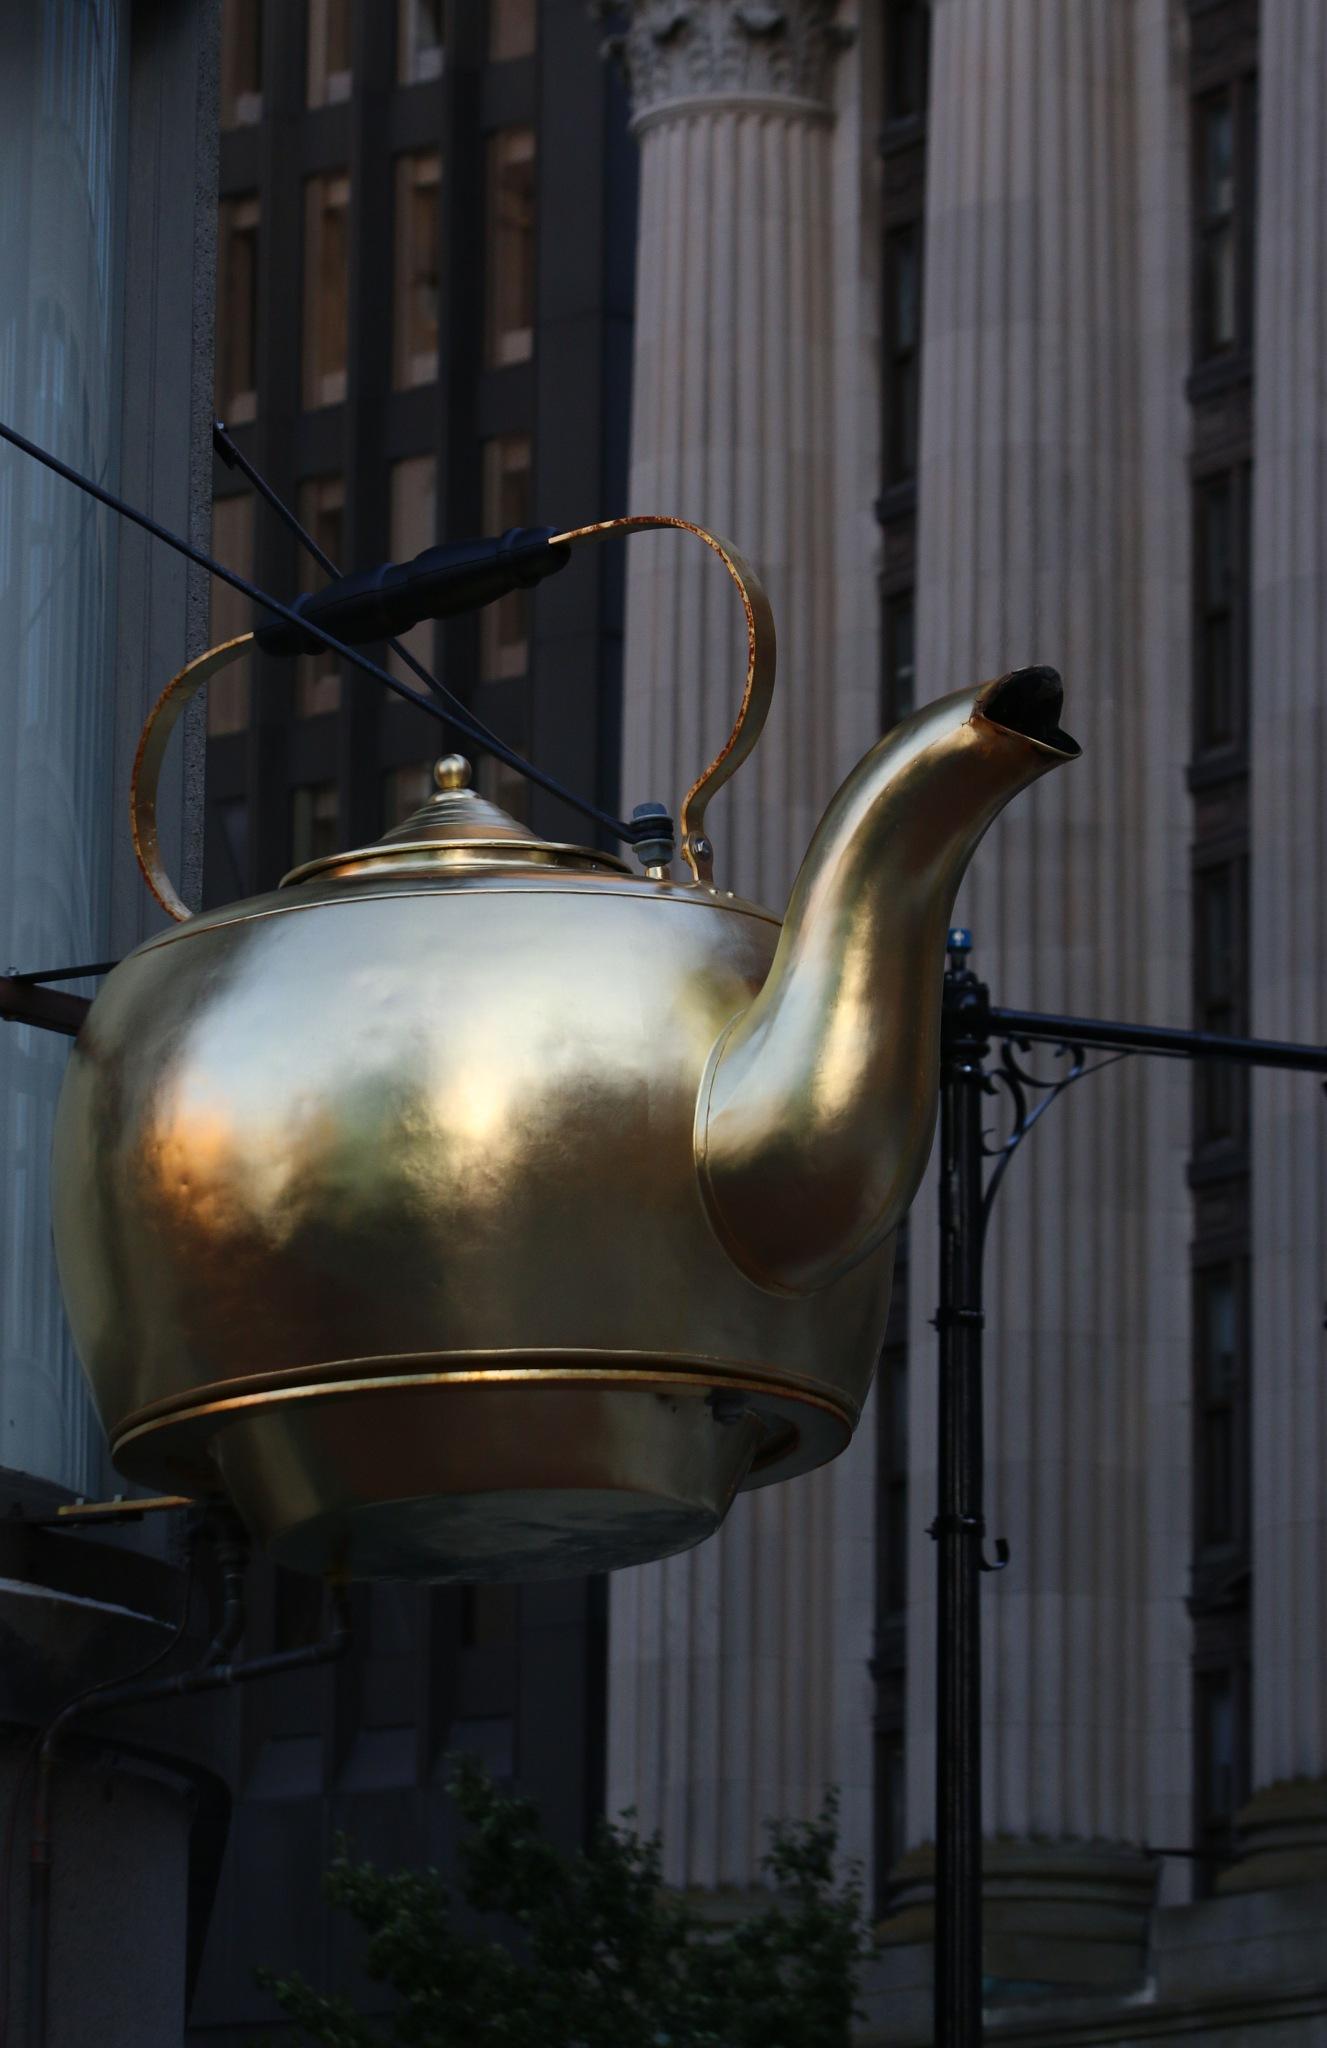 Tea Time by Michael McCasland